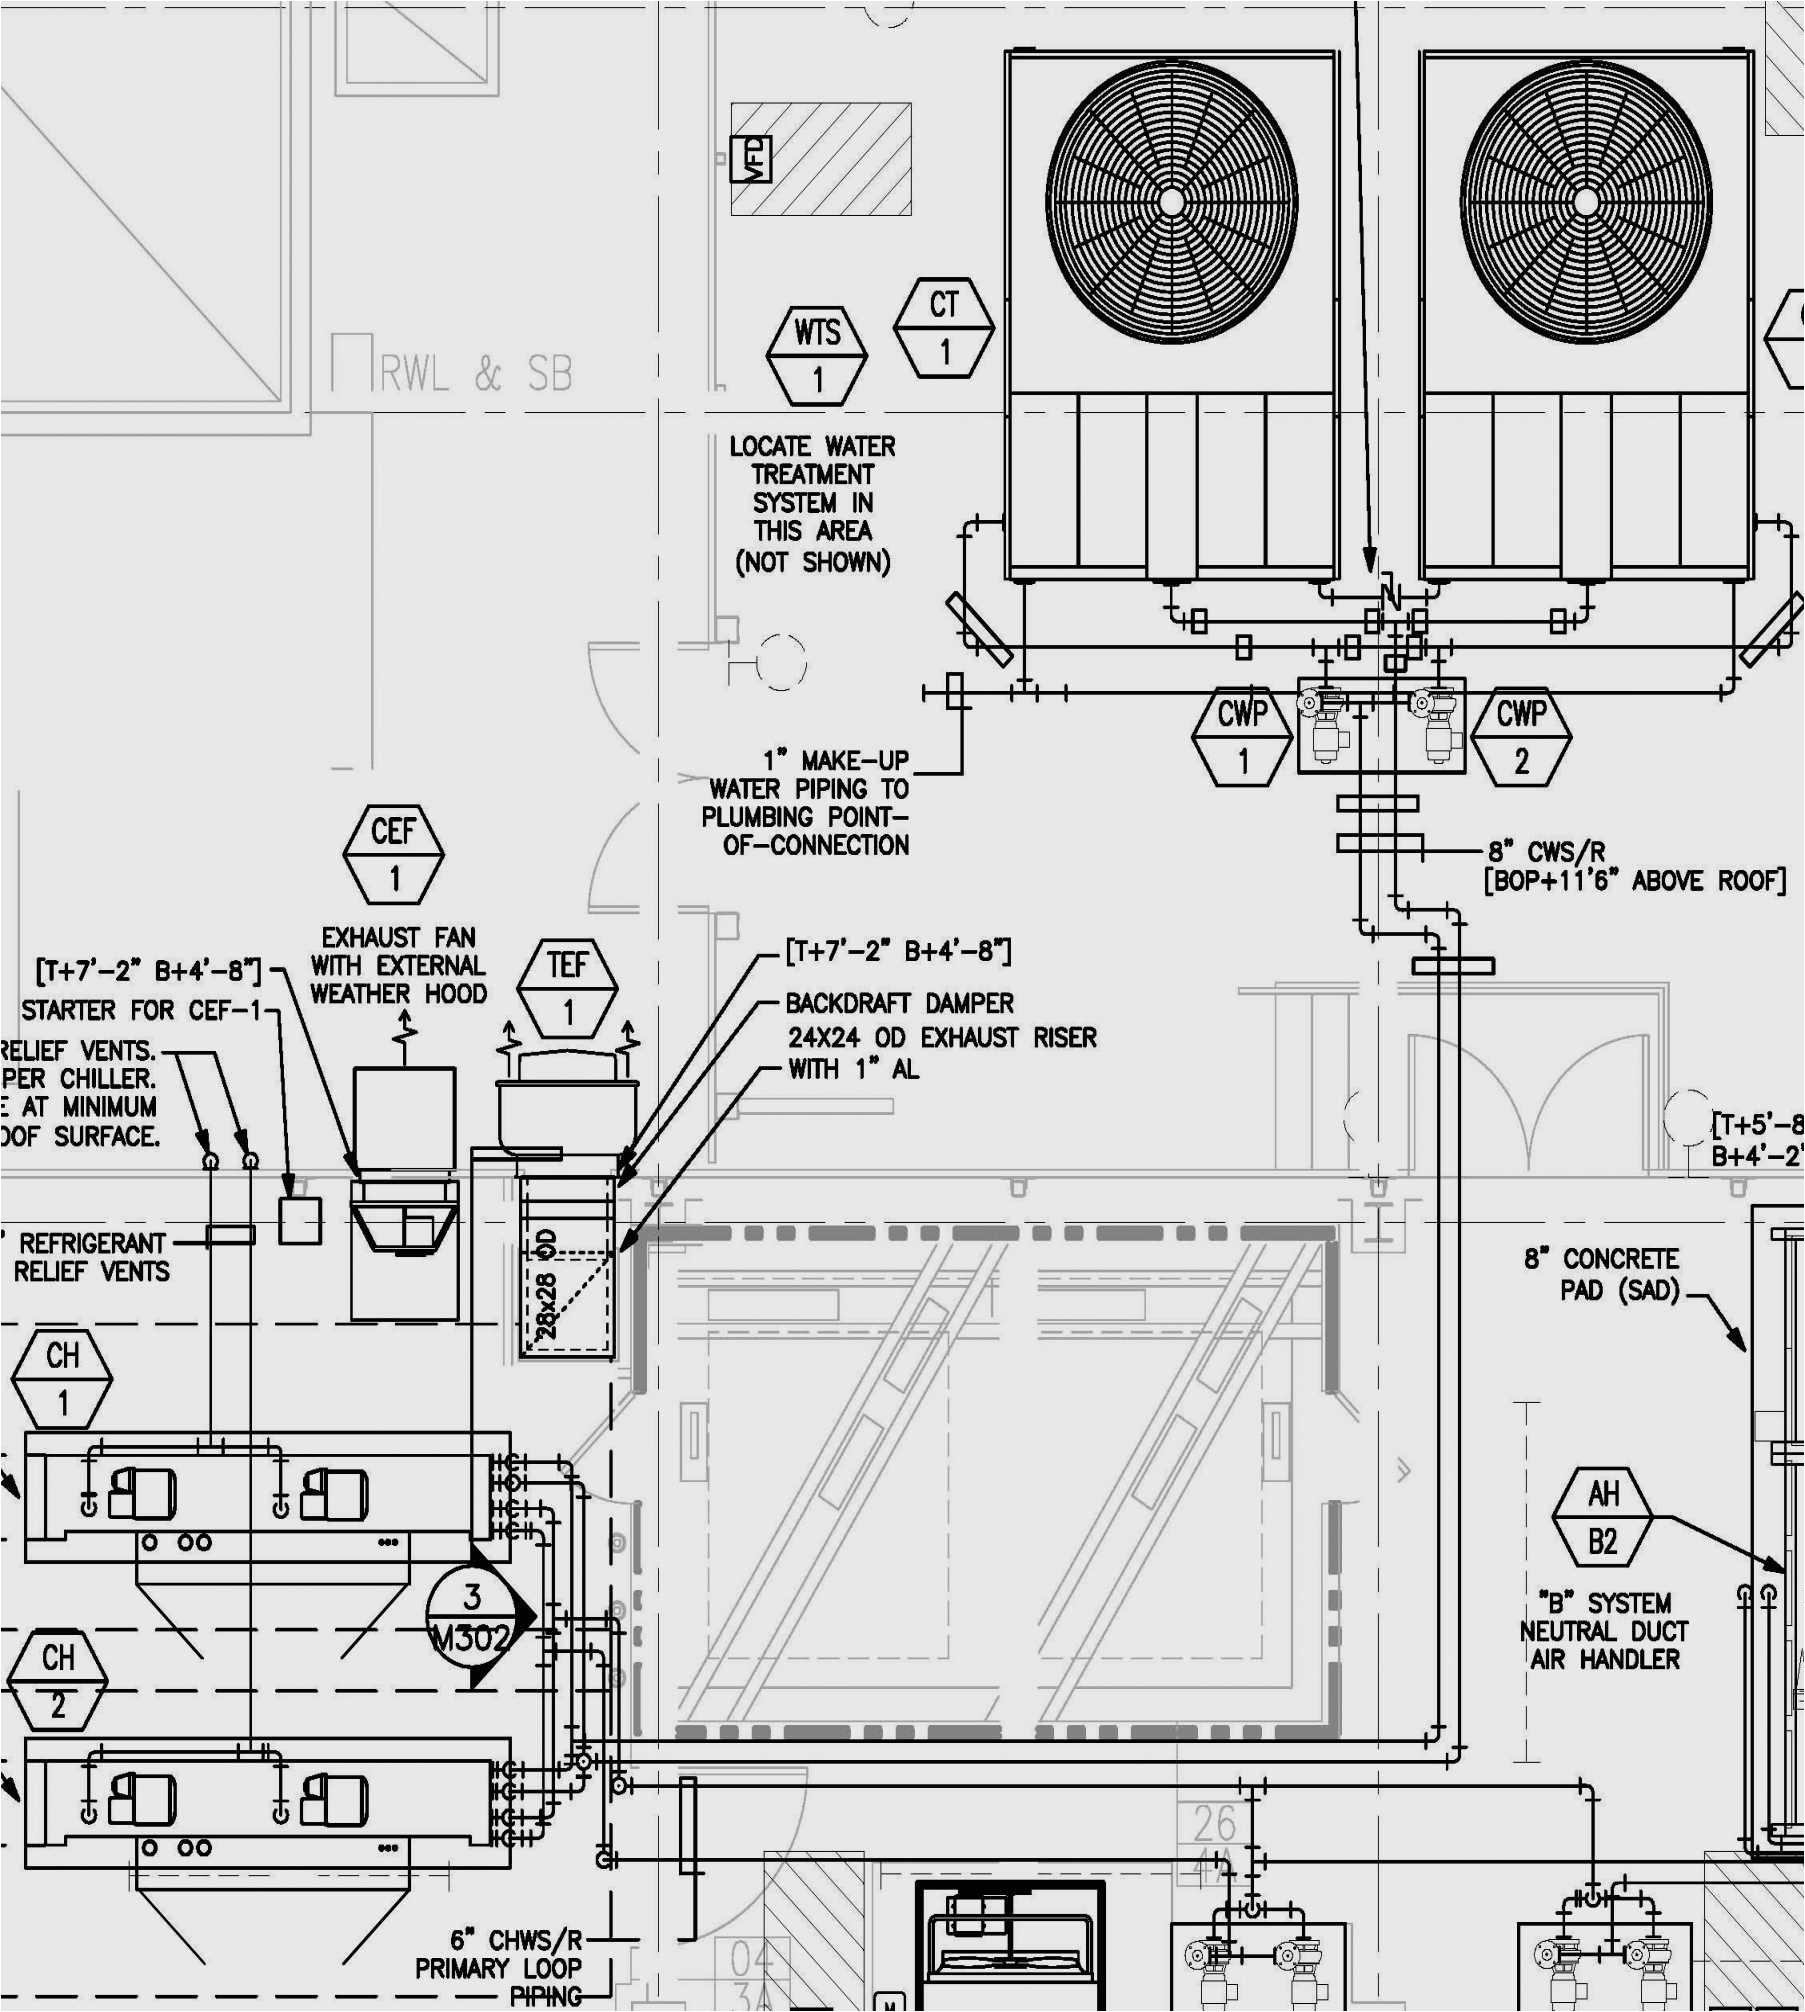 ezgo forward reverse switch wiring diagram 36 volt ez go marathon wiring diagram wiring diagram center of ezgo forward reverse switch wiring diagram 1